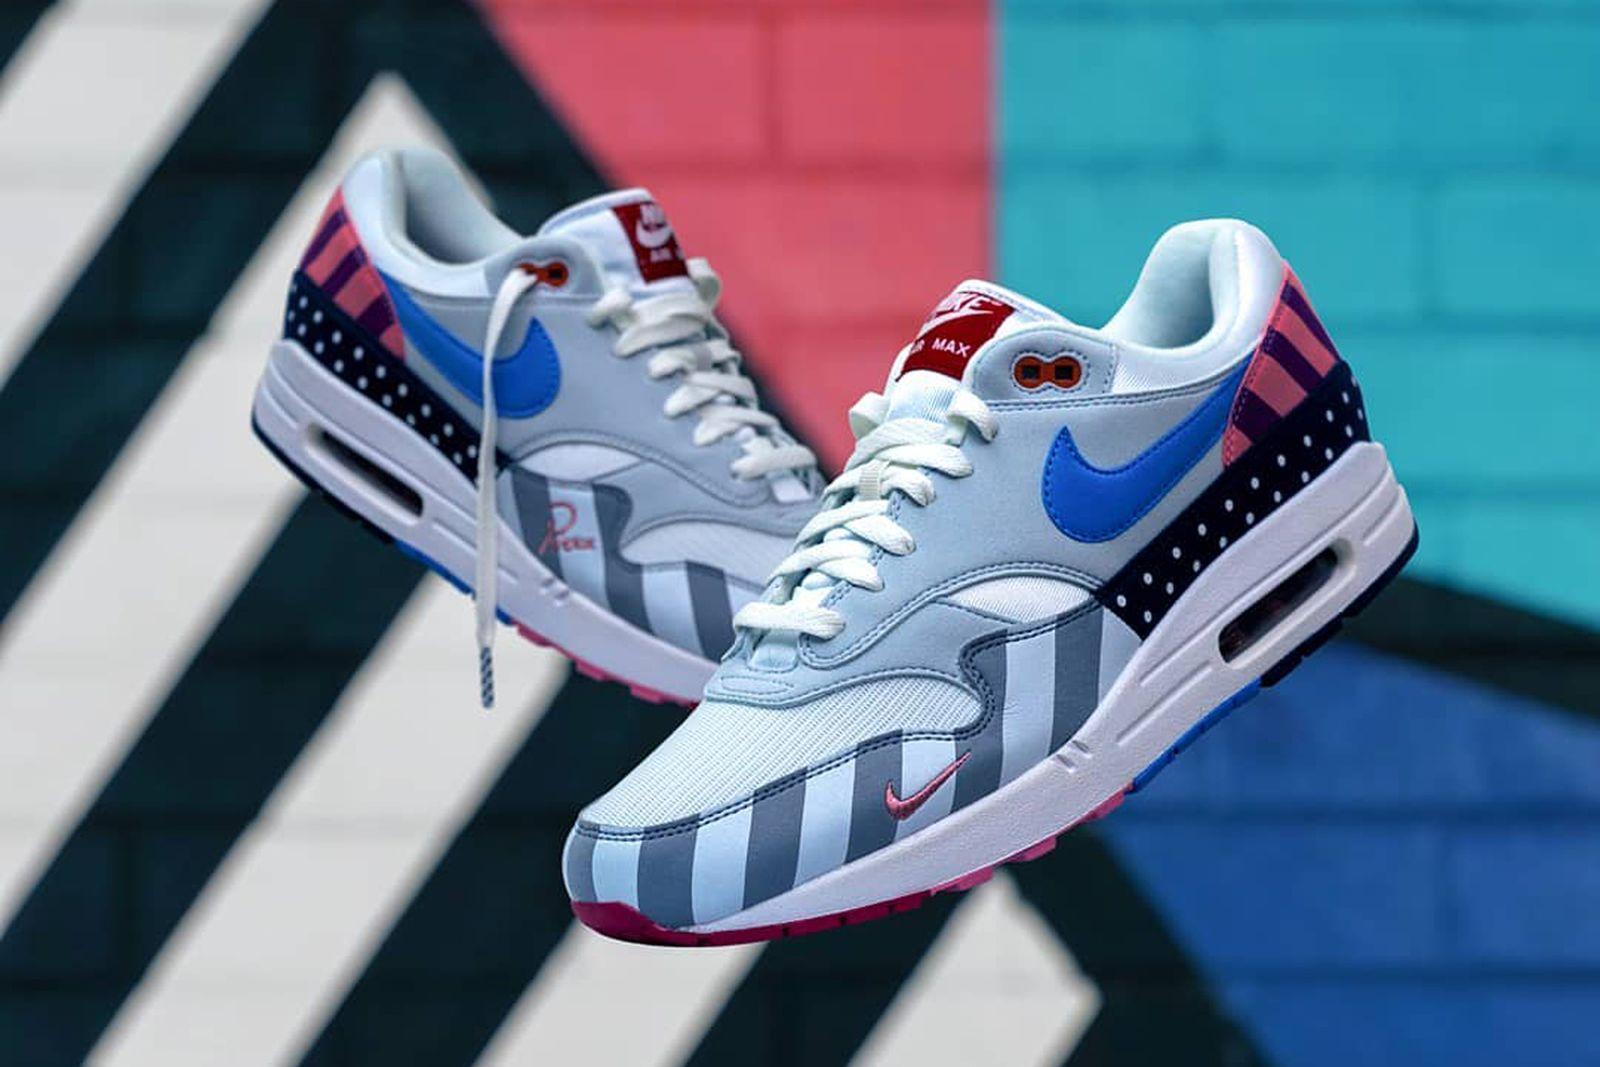 parra nike air max best instagram sneakers Maison Margiela Nike SB Dunk Low Pro adidas Ultra Boot